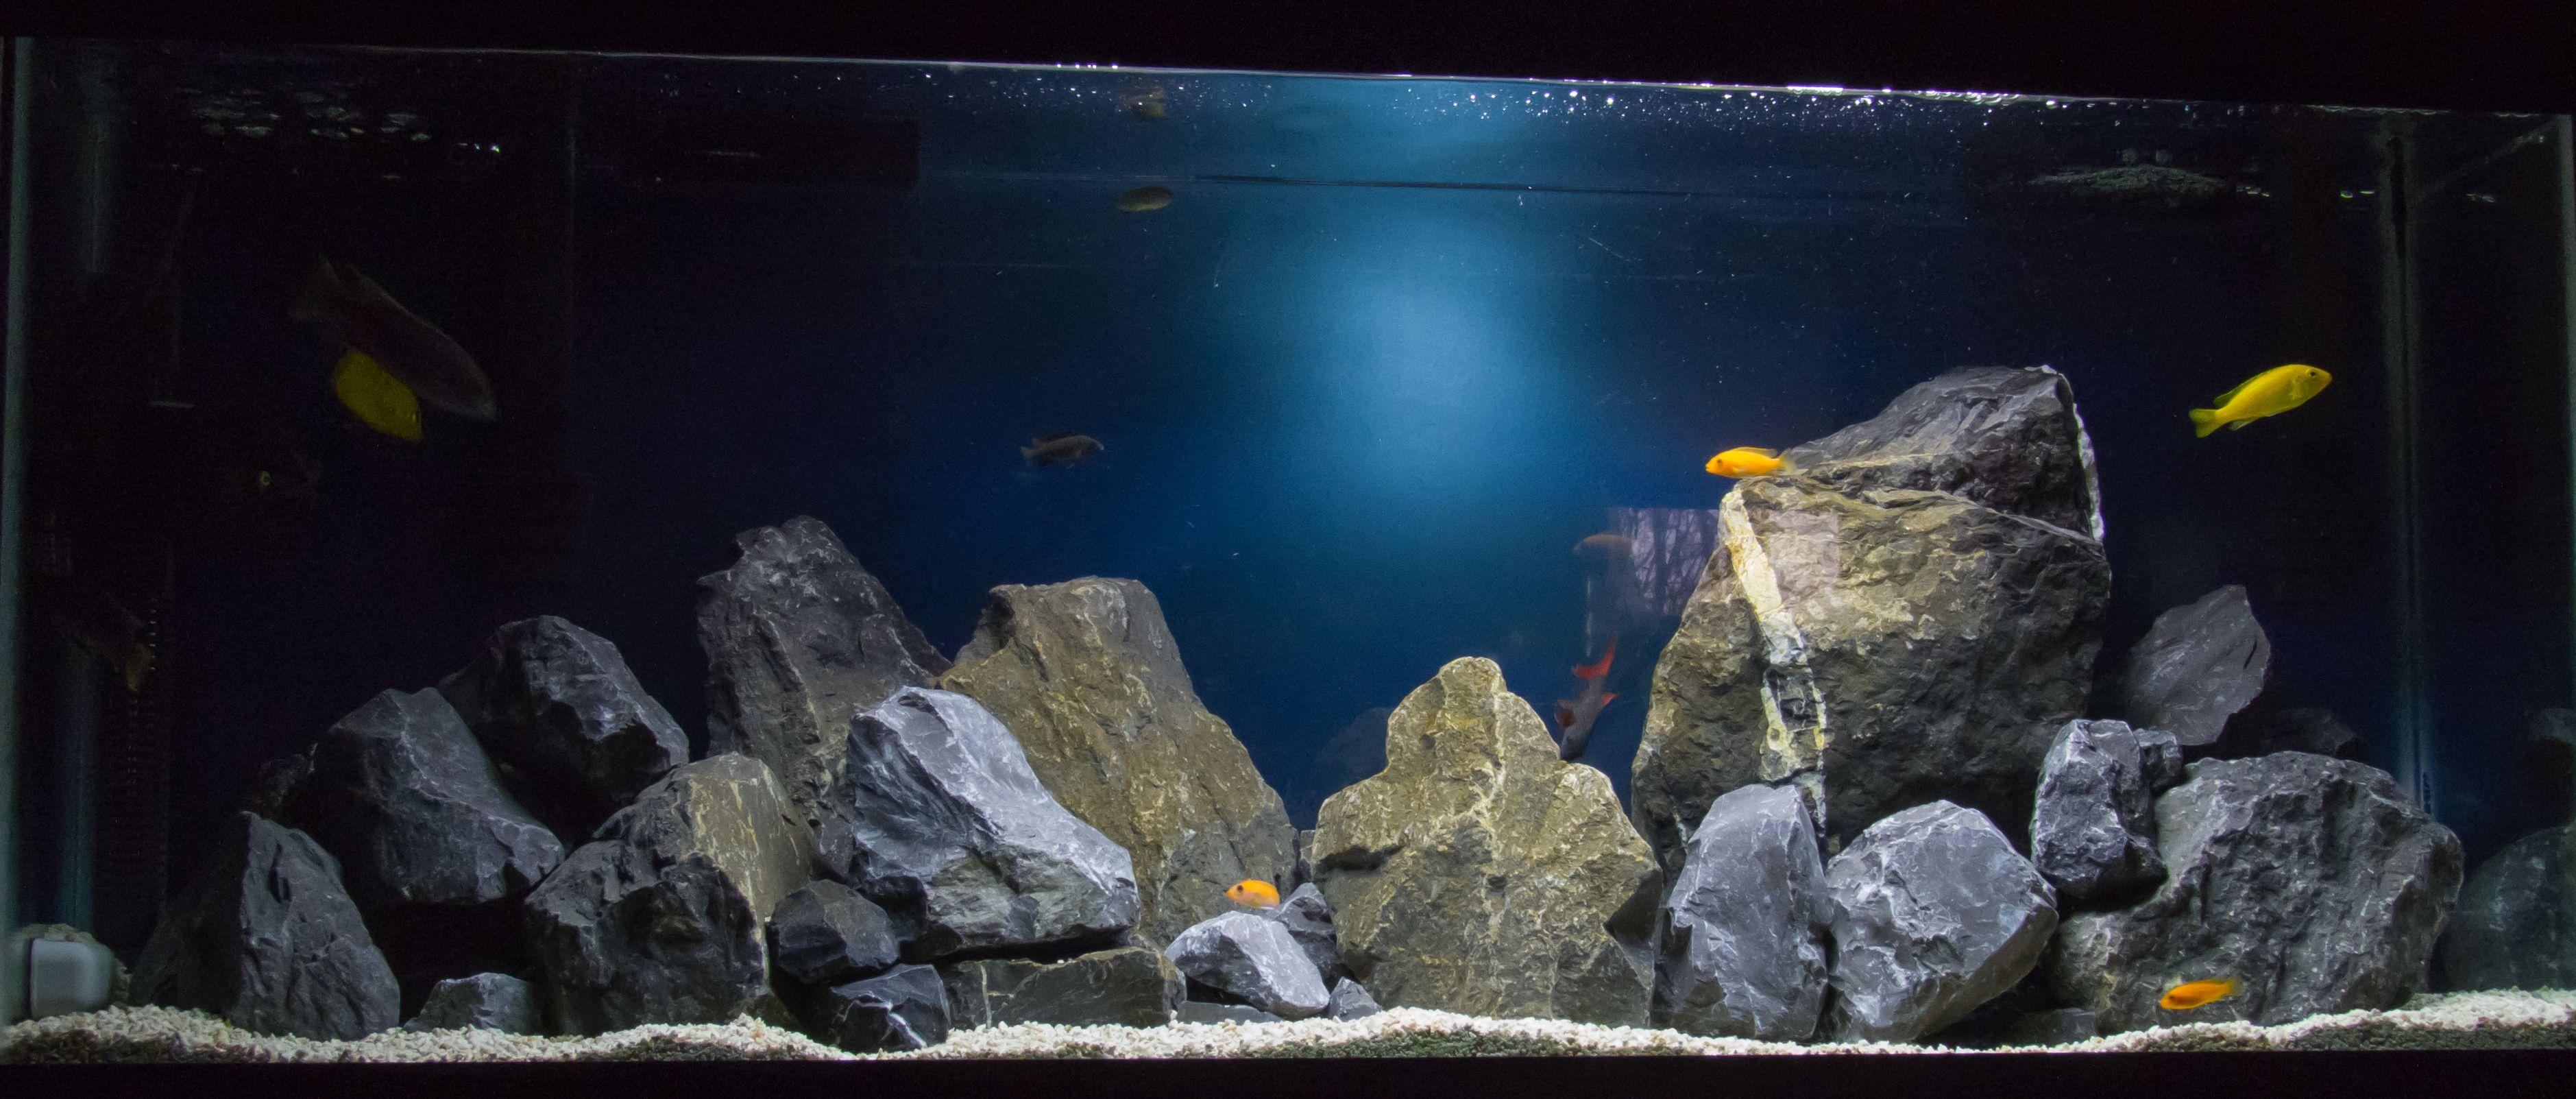 Cichlid Aquarium with 4W flourescent backlight